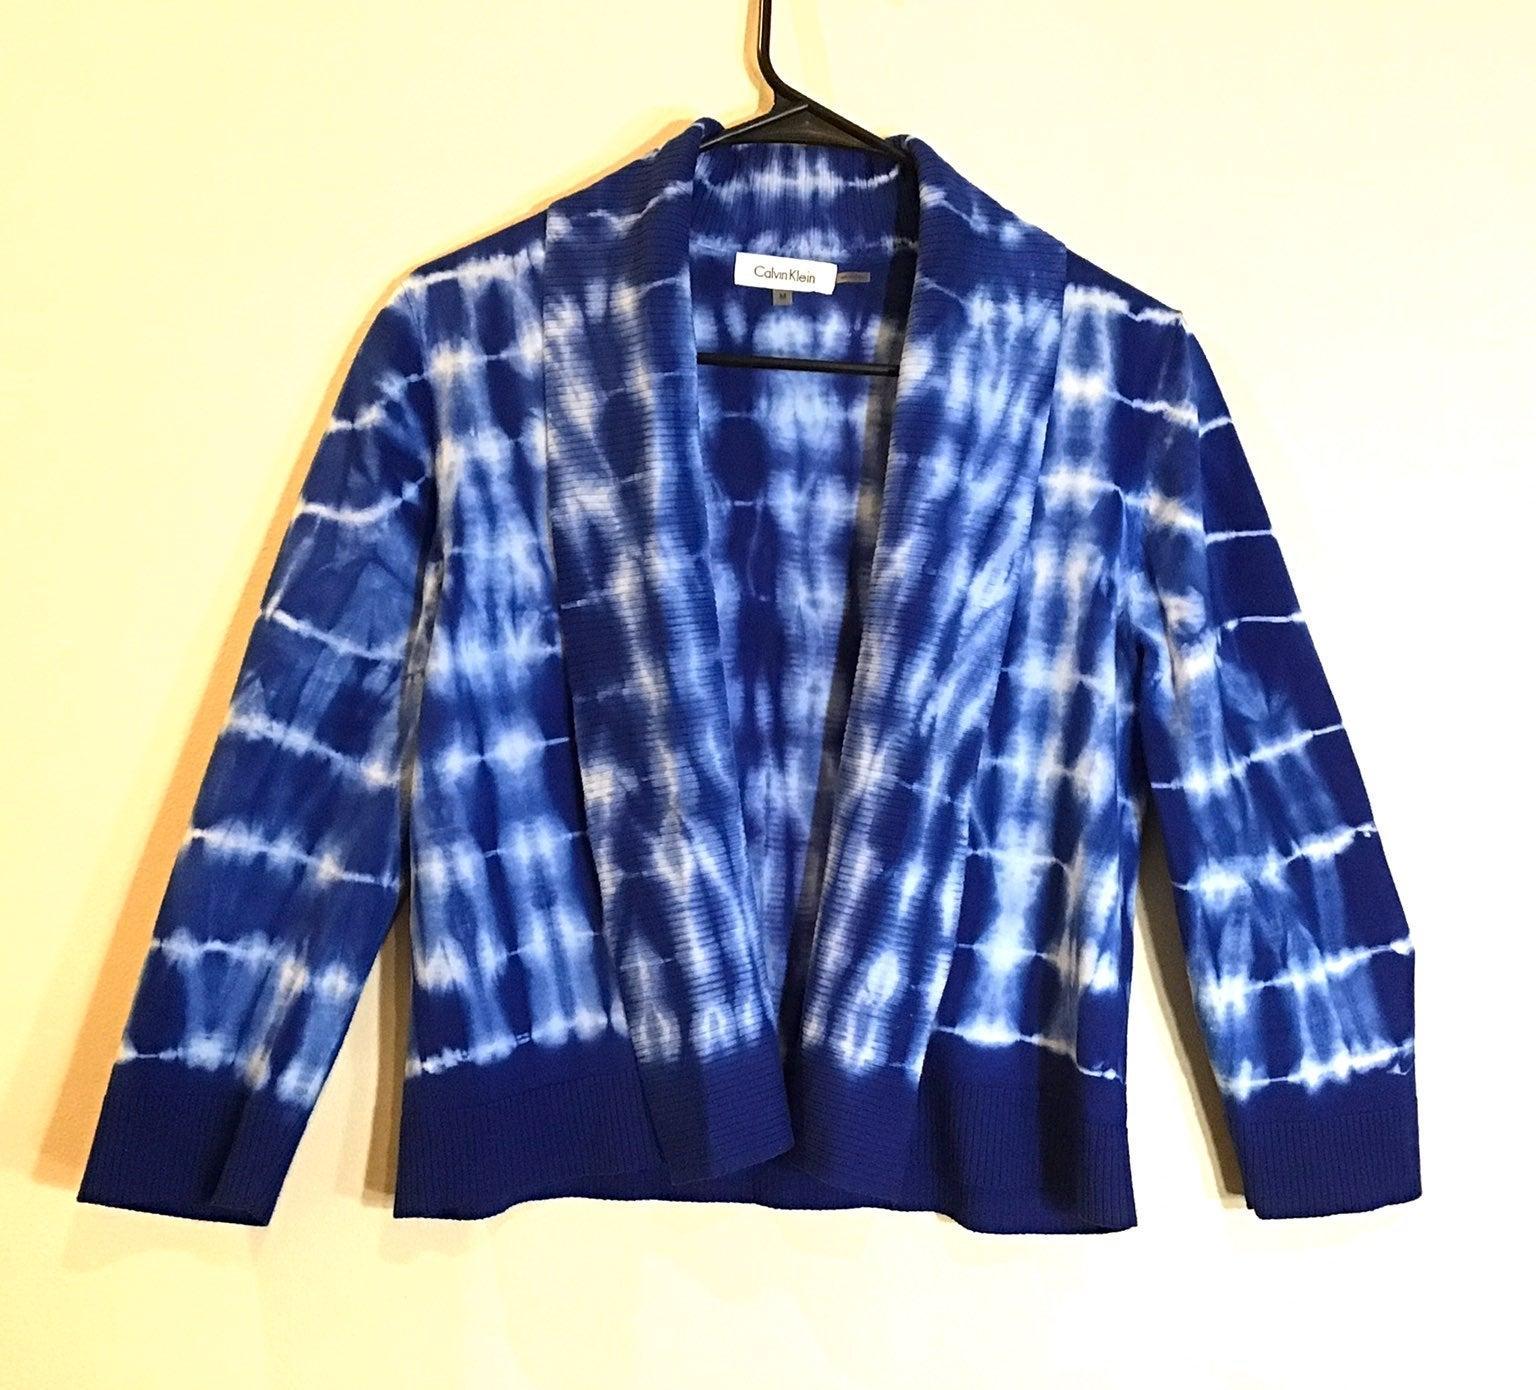 Calvin Klein Shrug Sweater